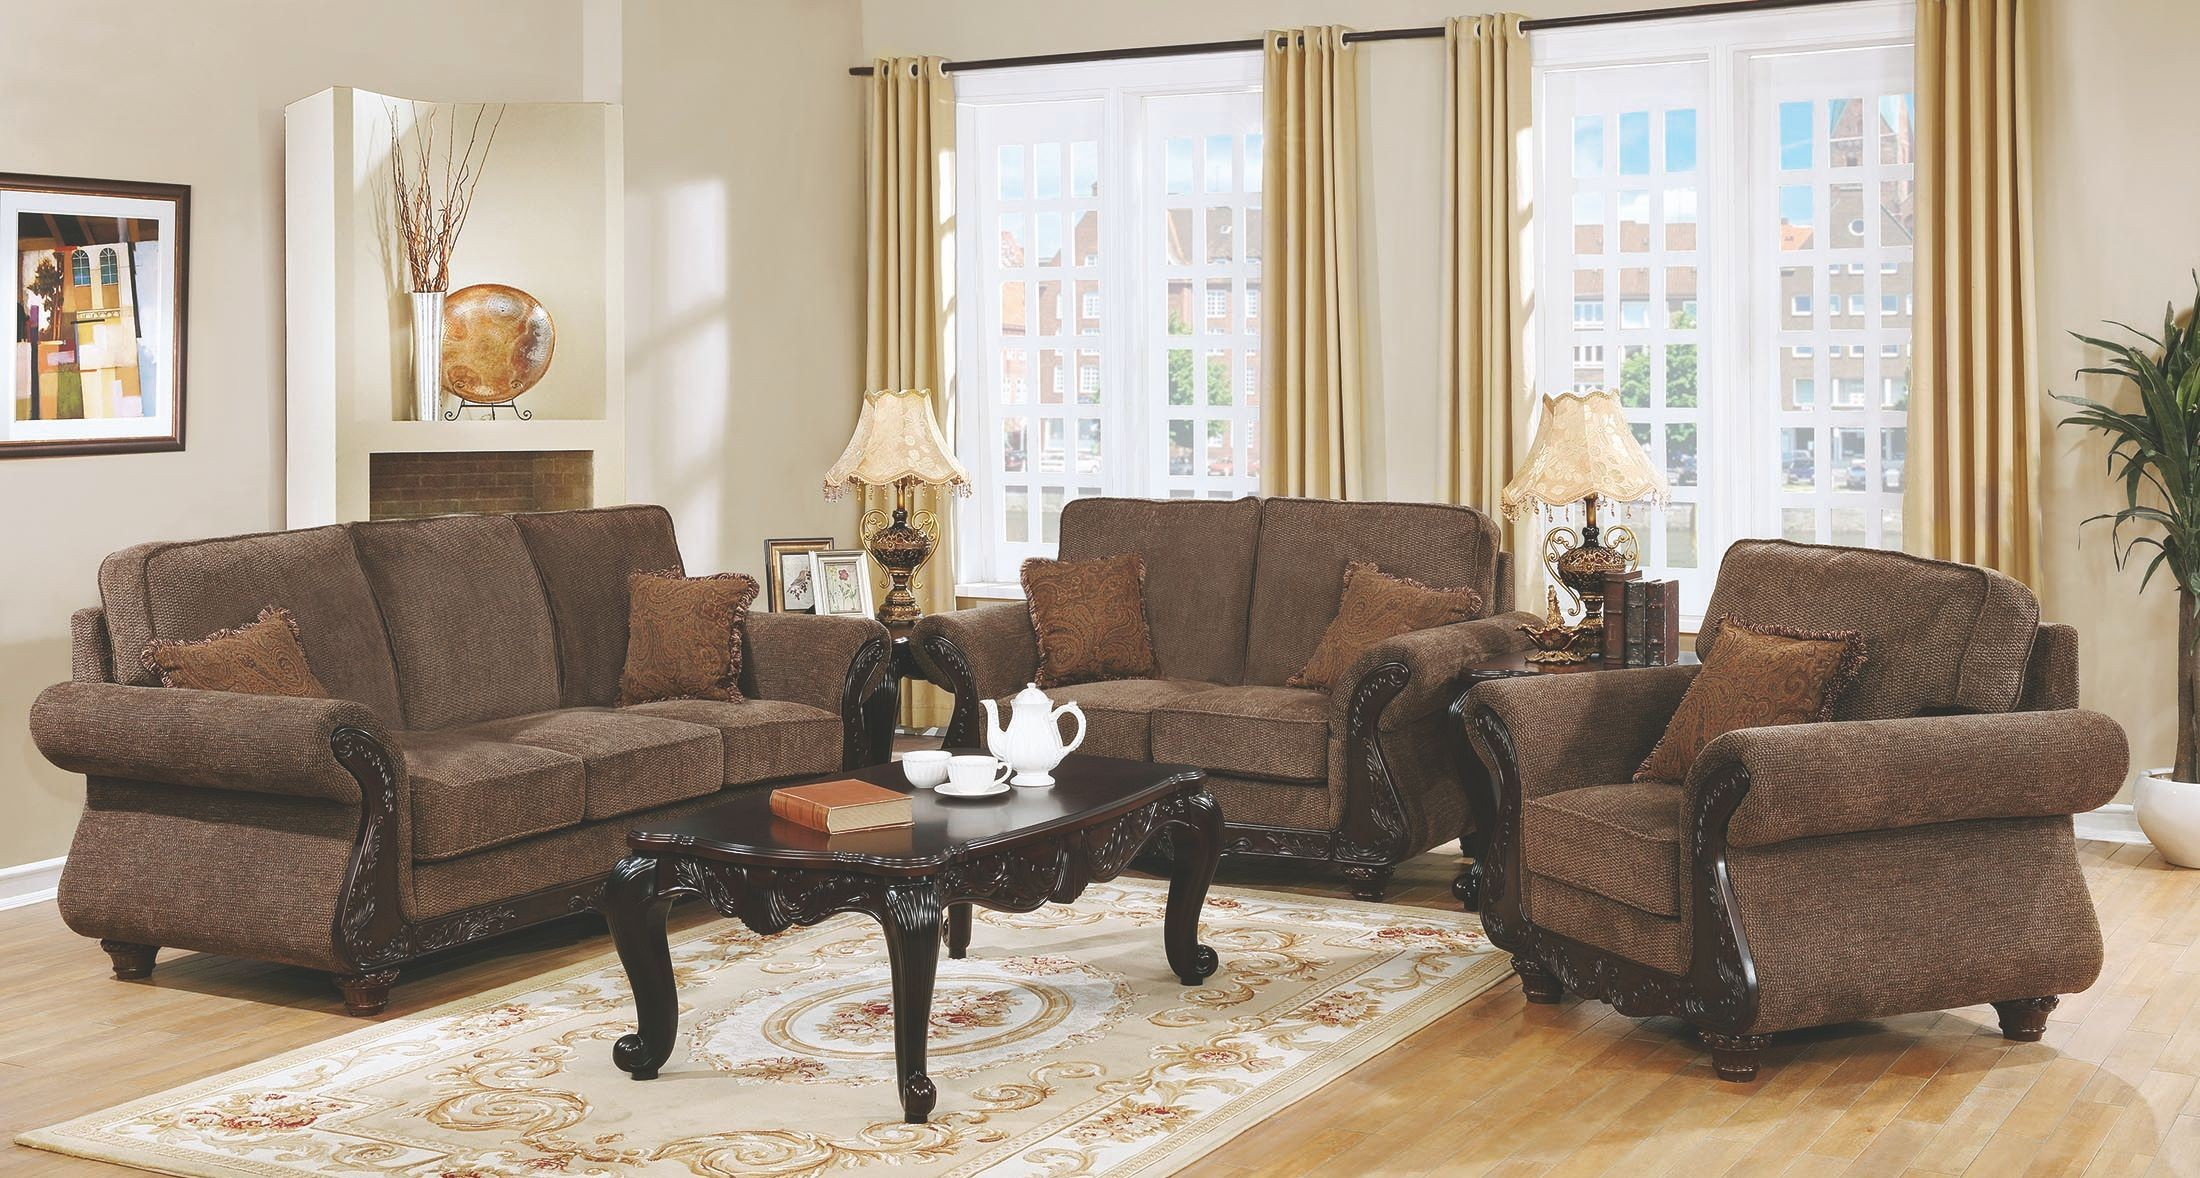 Phaedra light brown living room set 506411 coaster furniture for Light brown living room